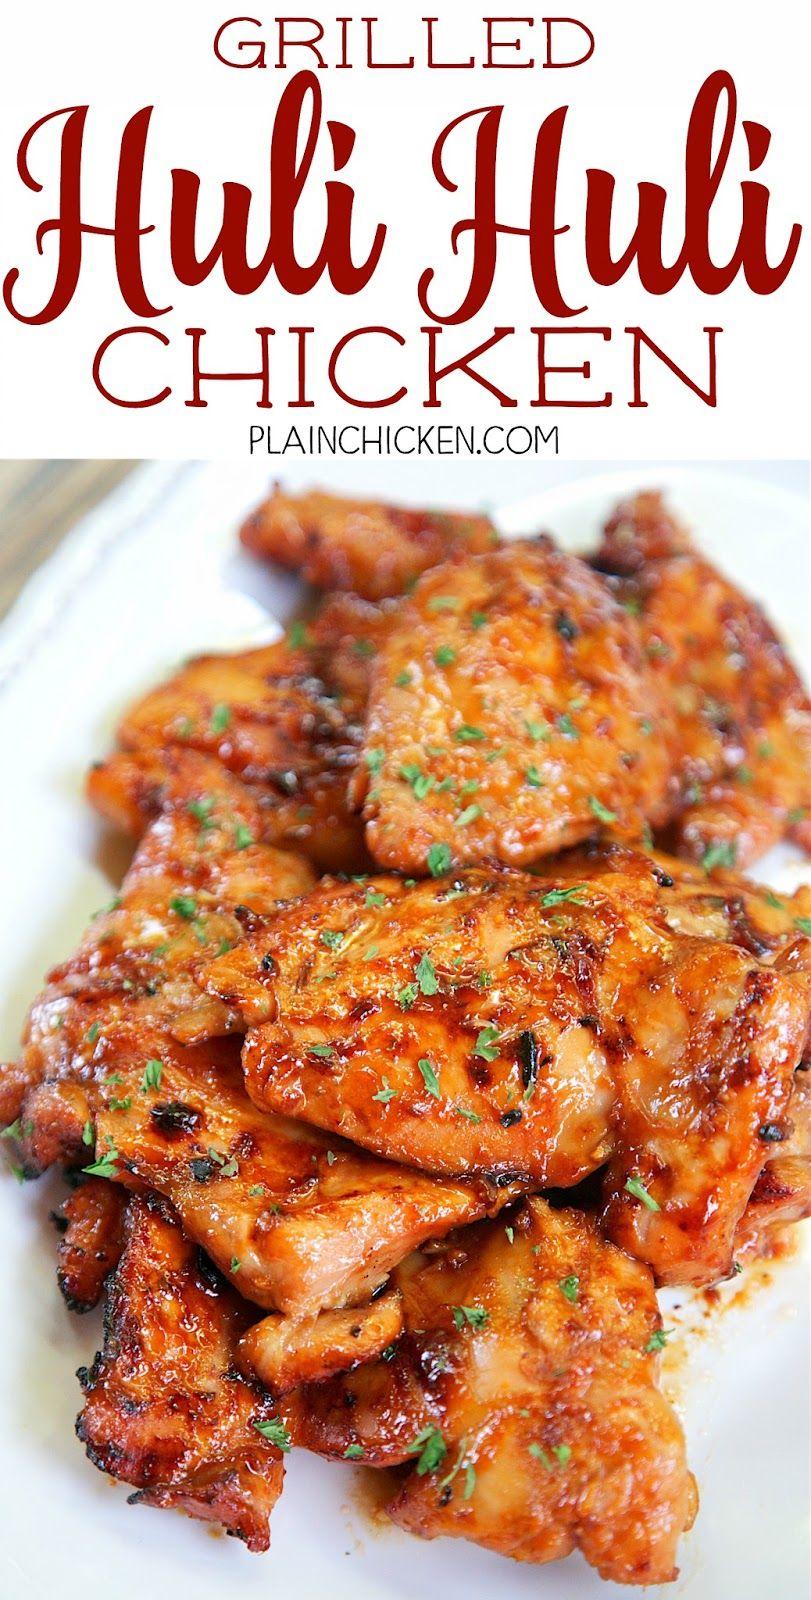 Grilled Huli Huli Chicken #grillingrecipes